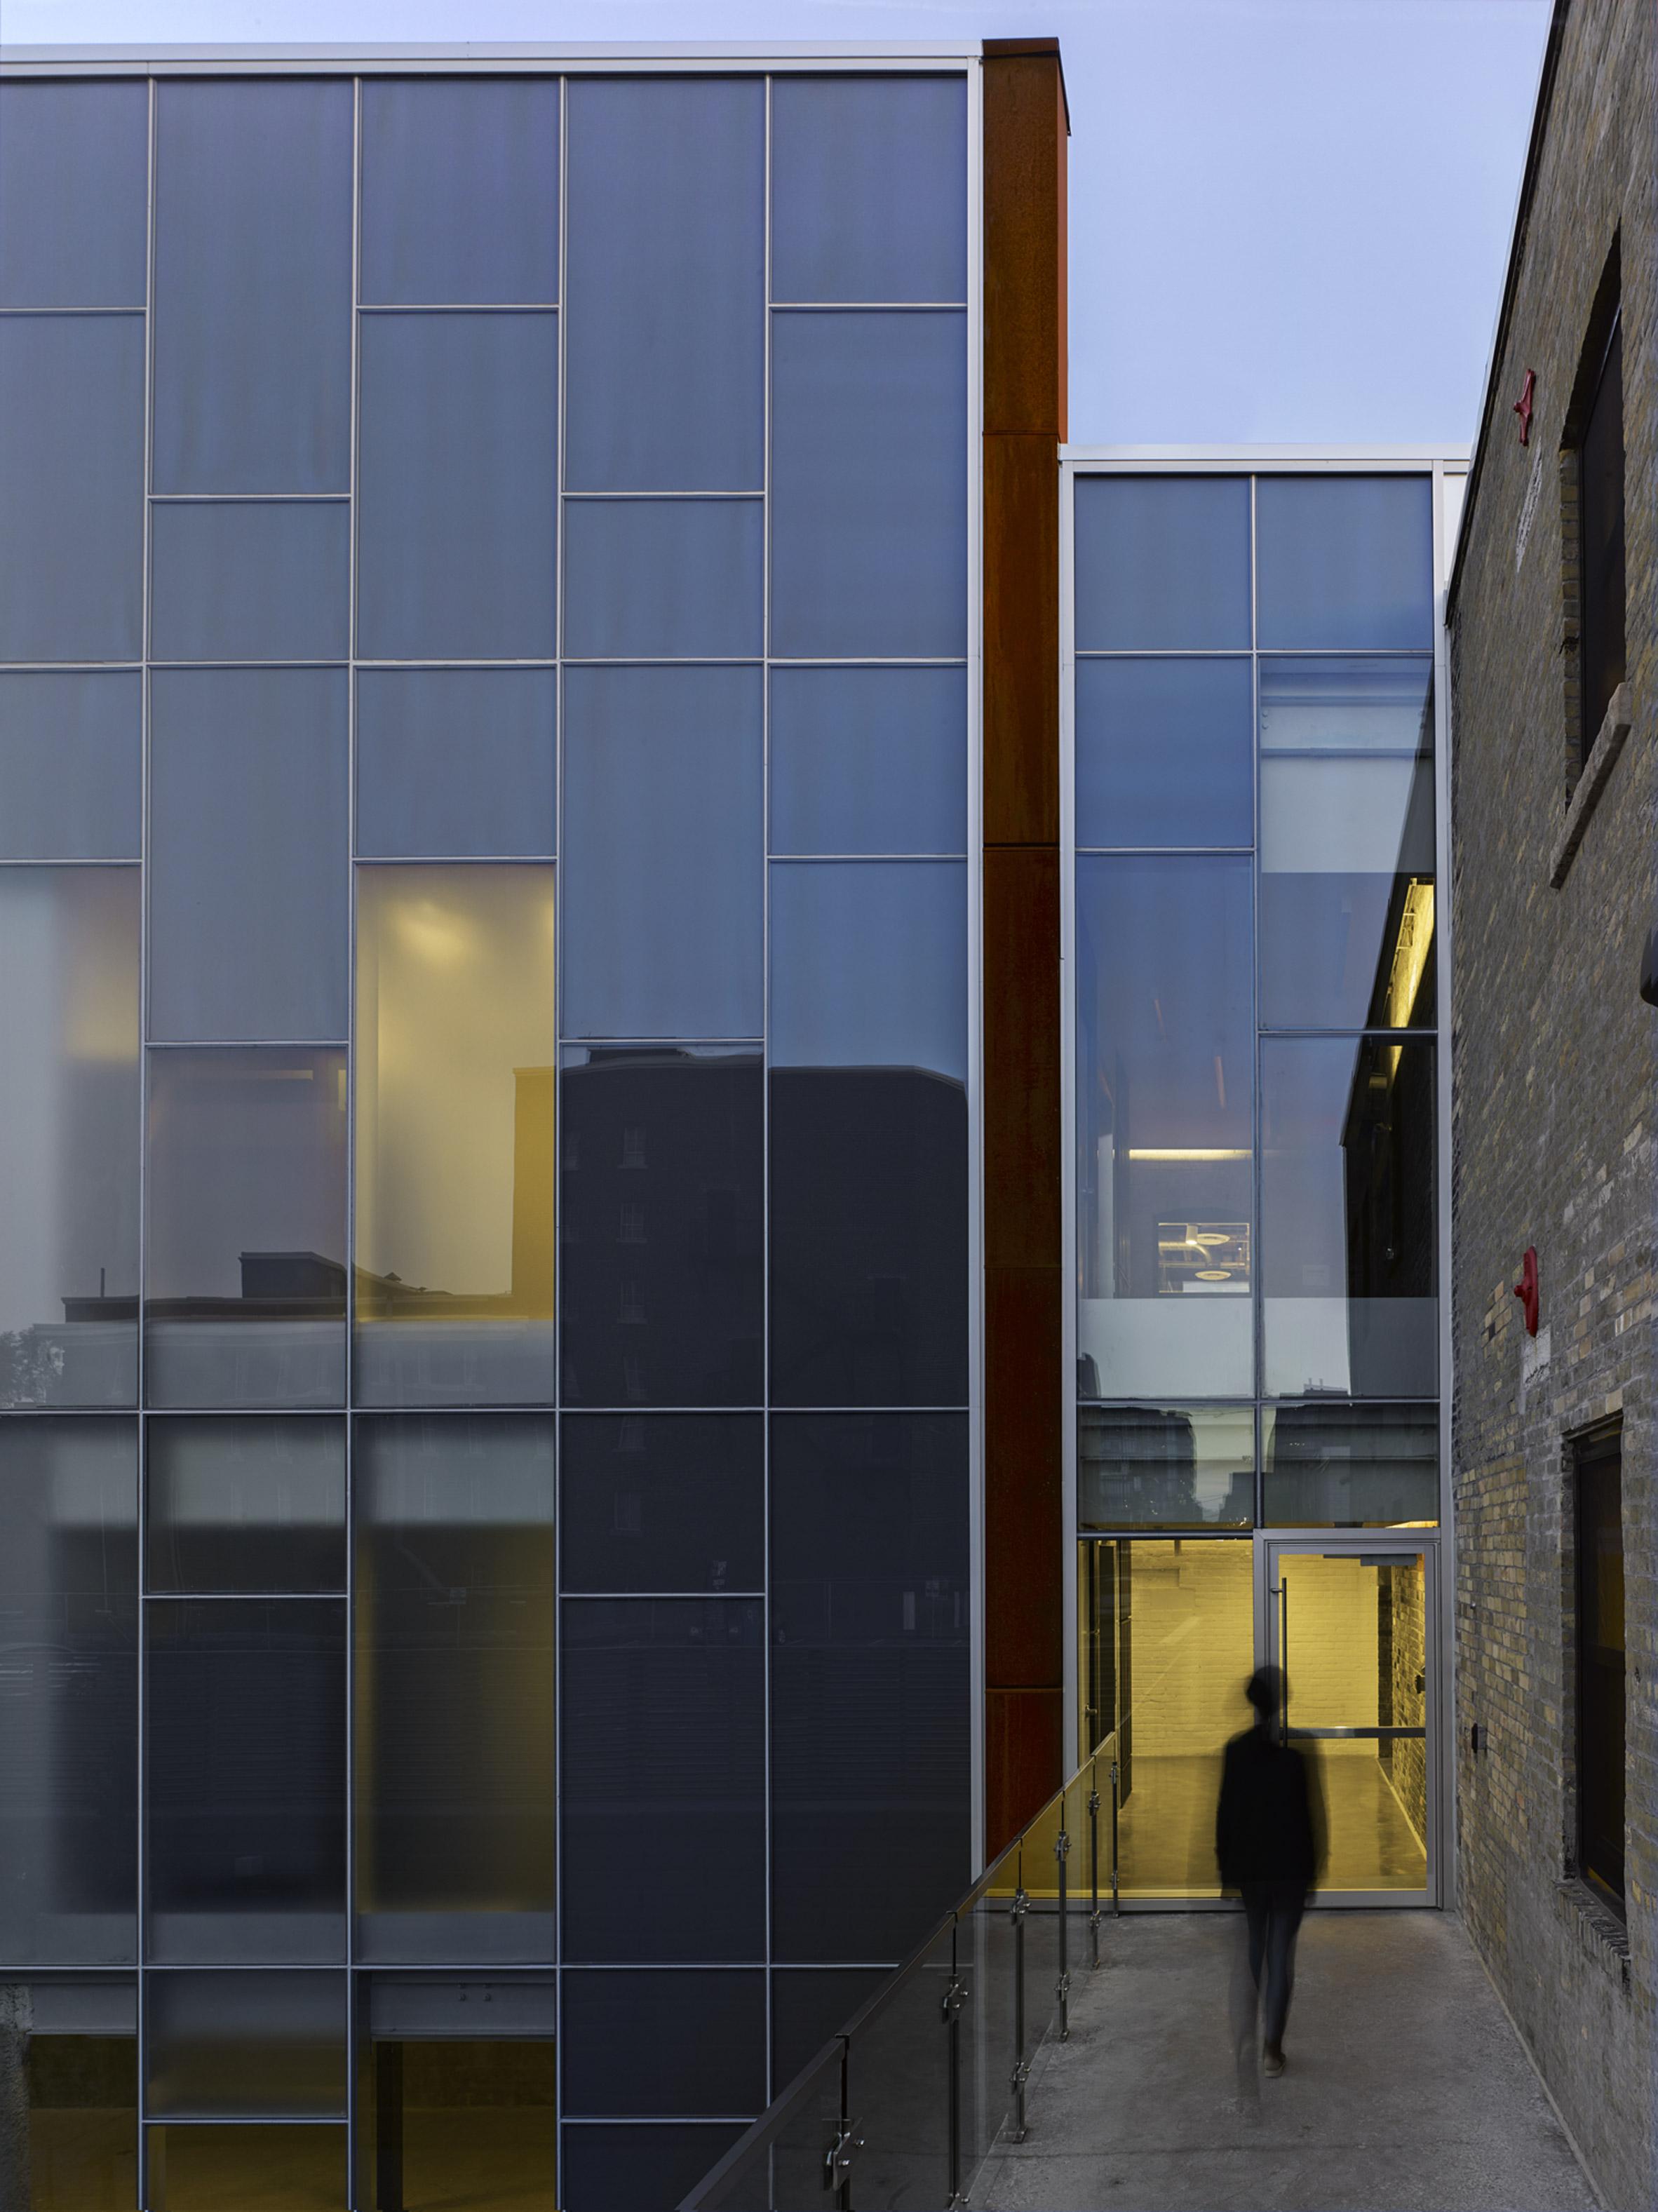 Quadrangle Architects transforms brick warehouse in Toronto into creative workspaces